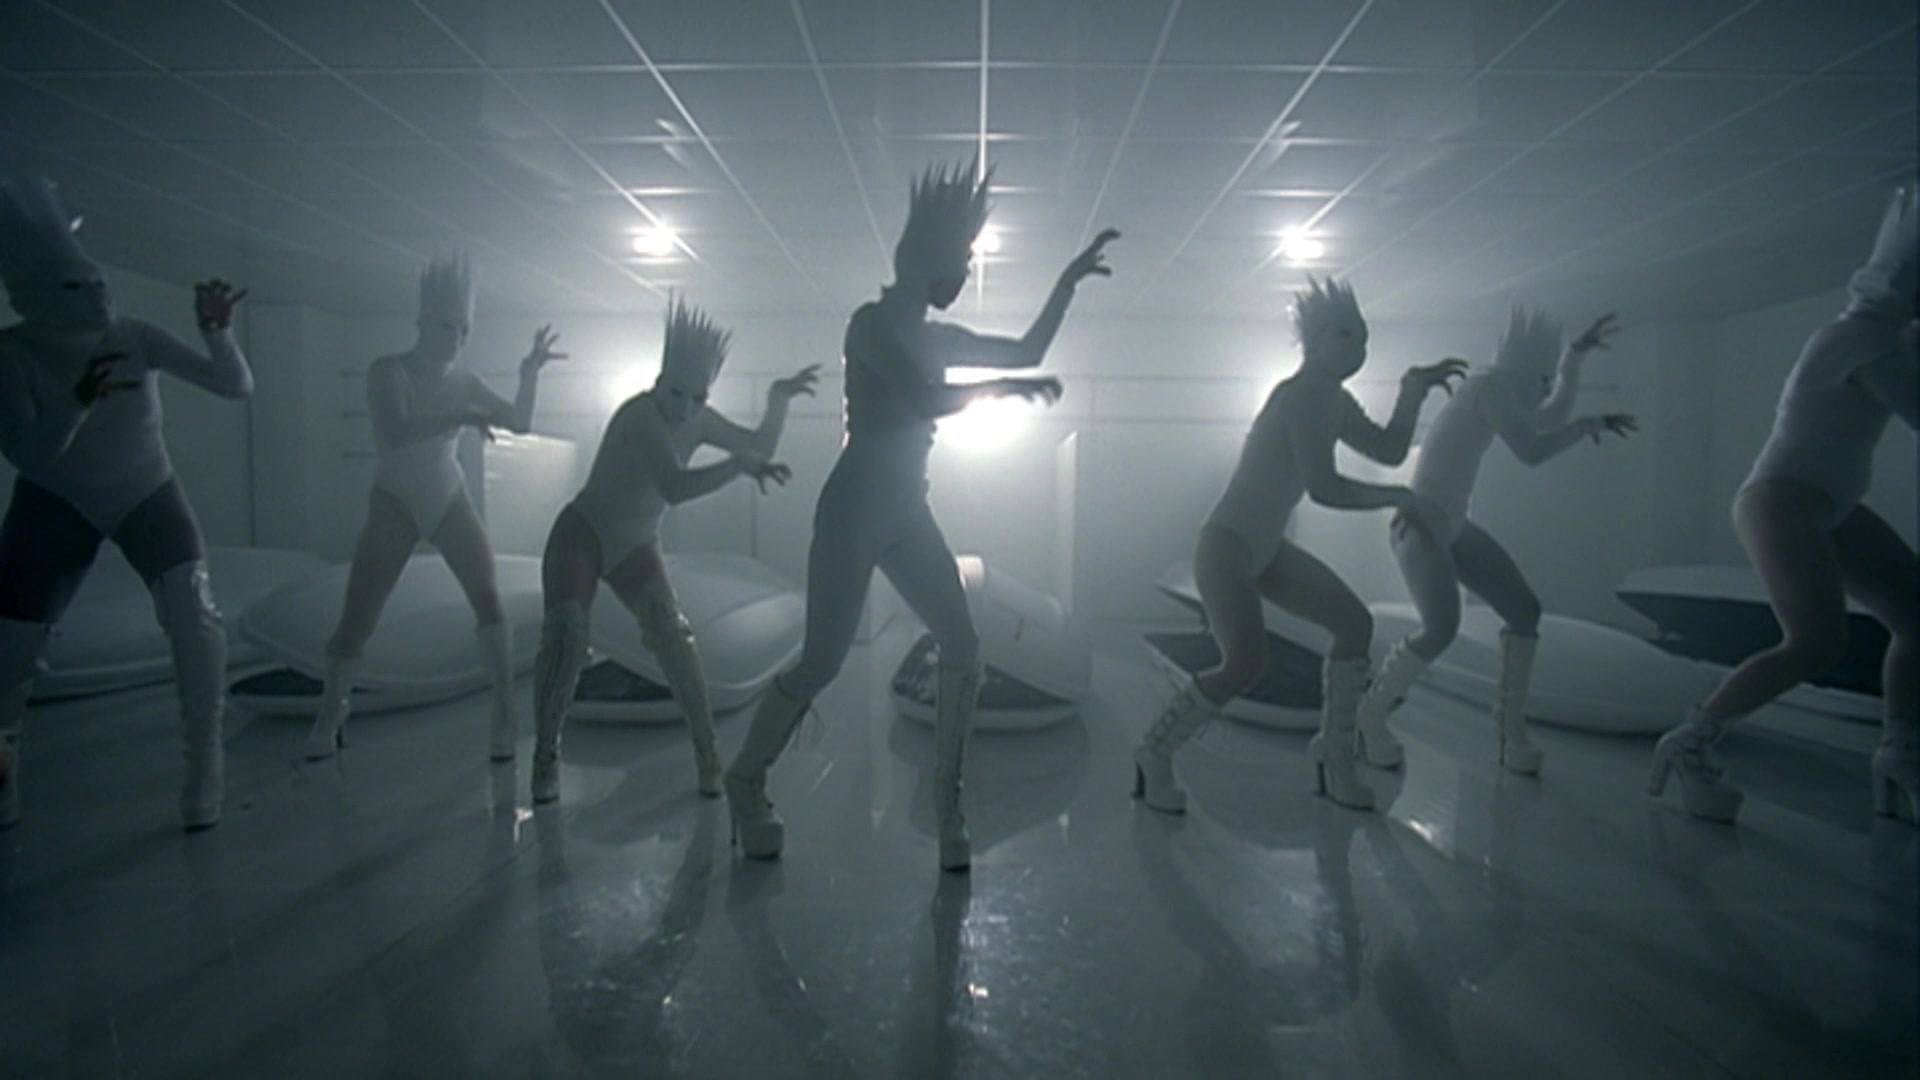 File:Lady Gaga - Bad Romance 008.jpg